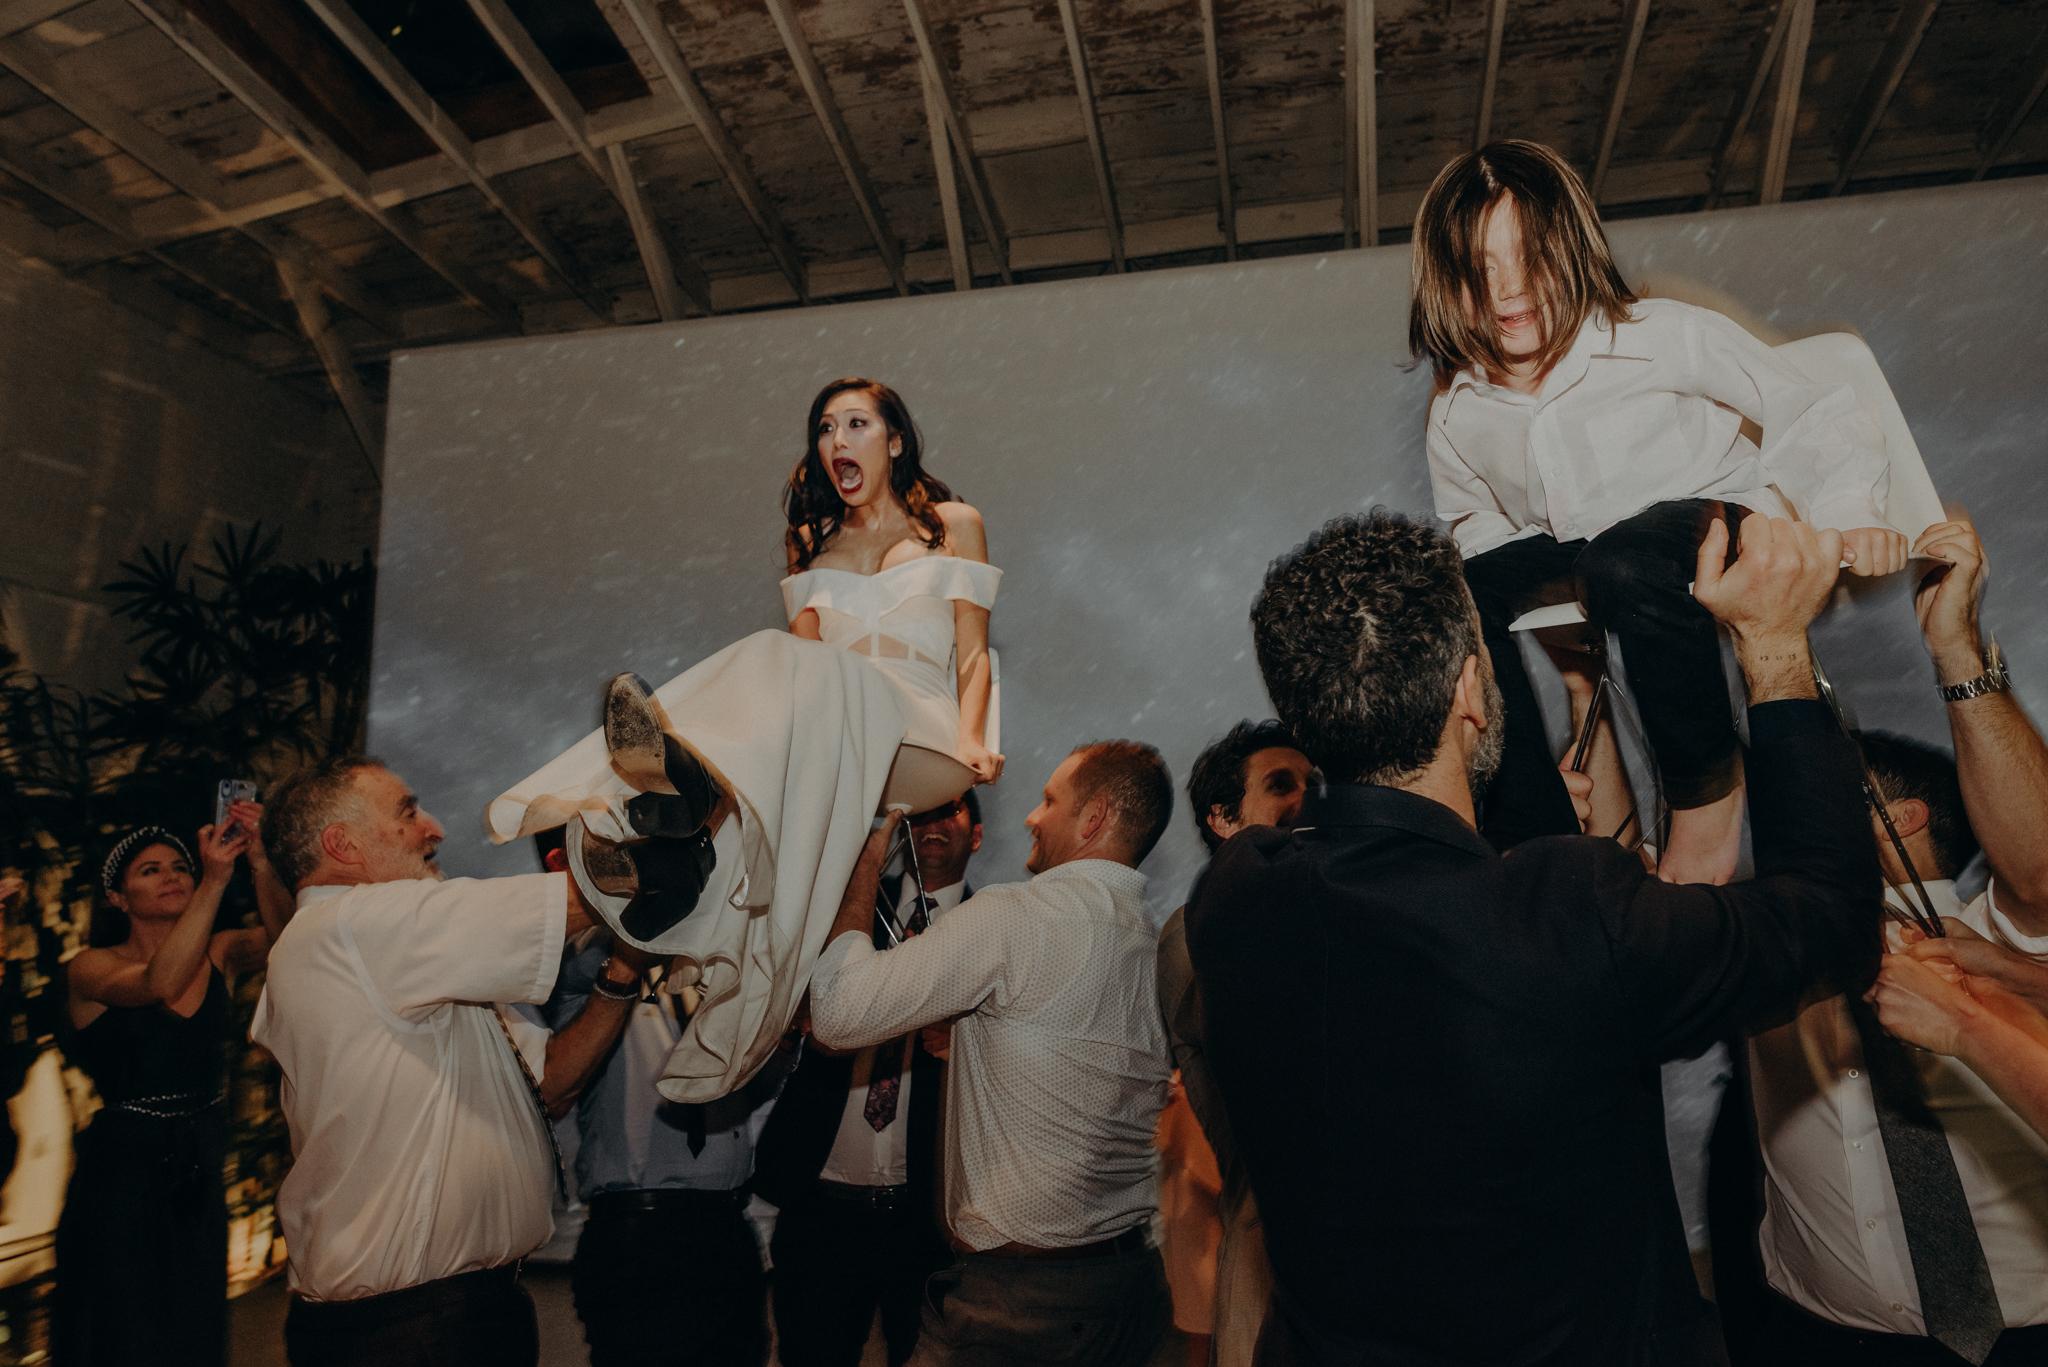 Wedding Photo LA - wedding photographer in los angeles - millwick wedding venue -isaiahandtaylor.com-147.jpg